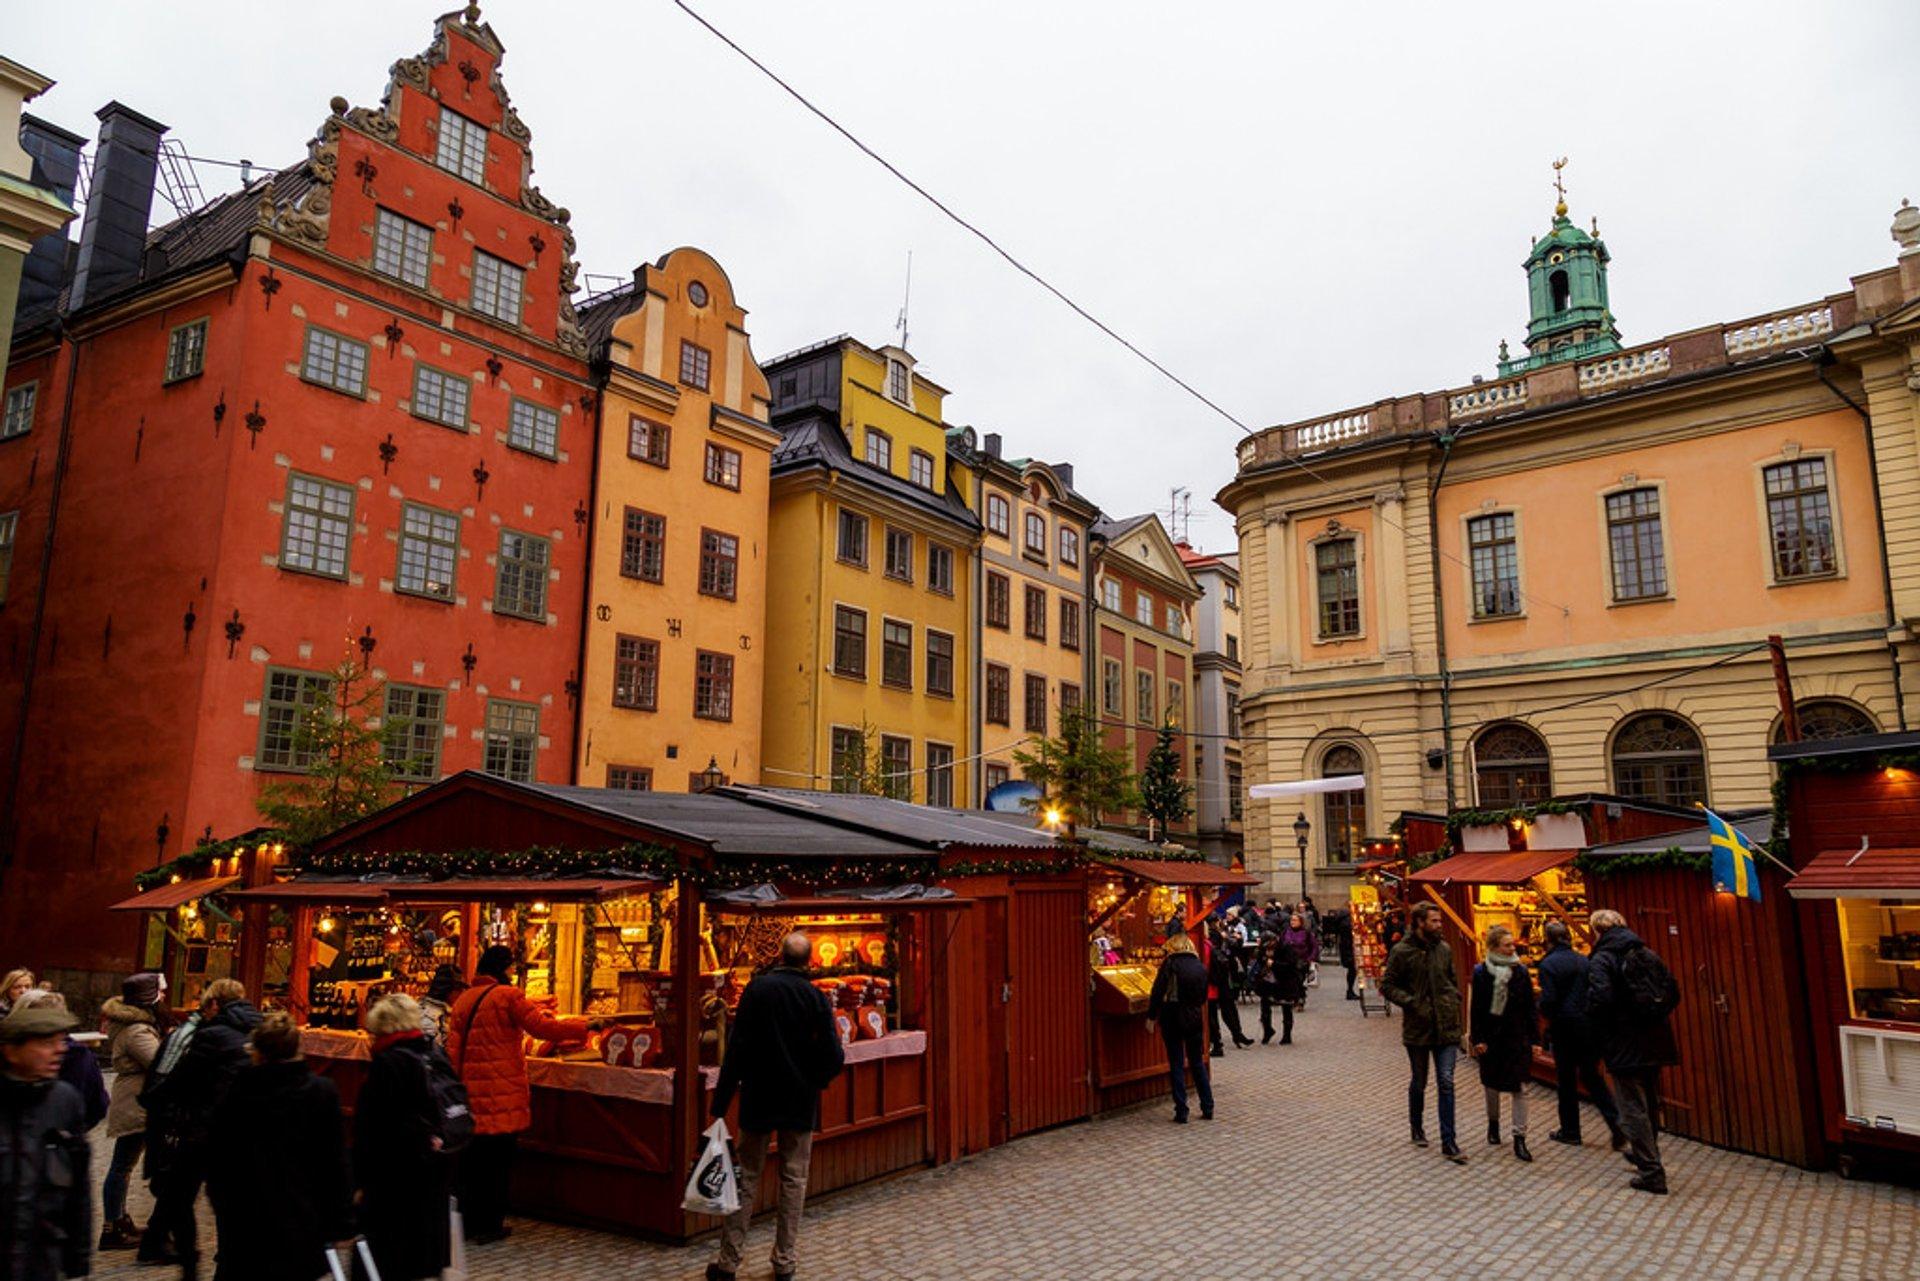 Stockholm Christmas Market 2020